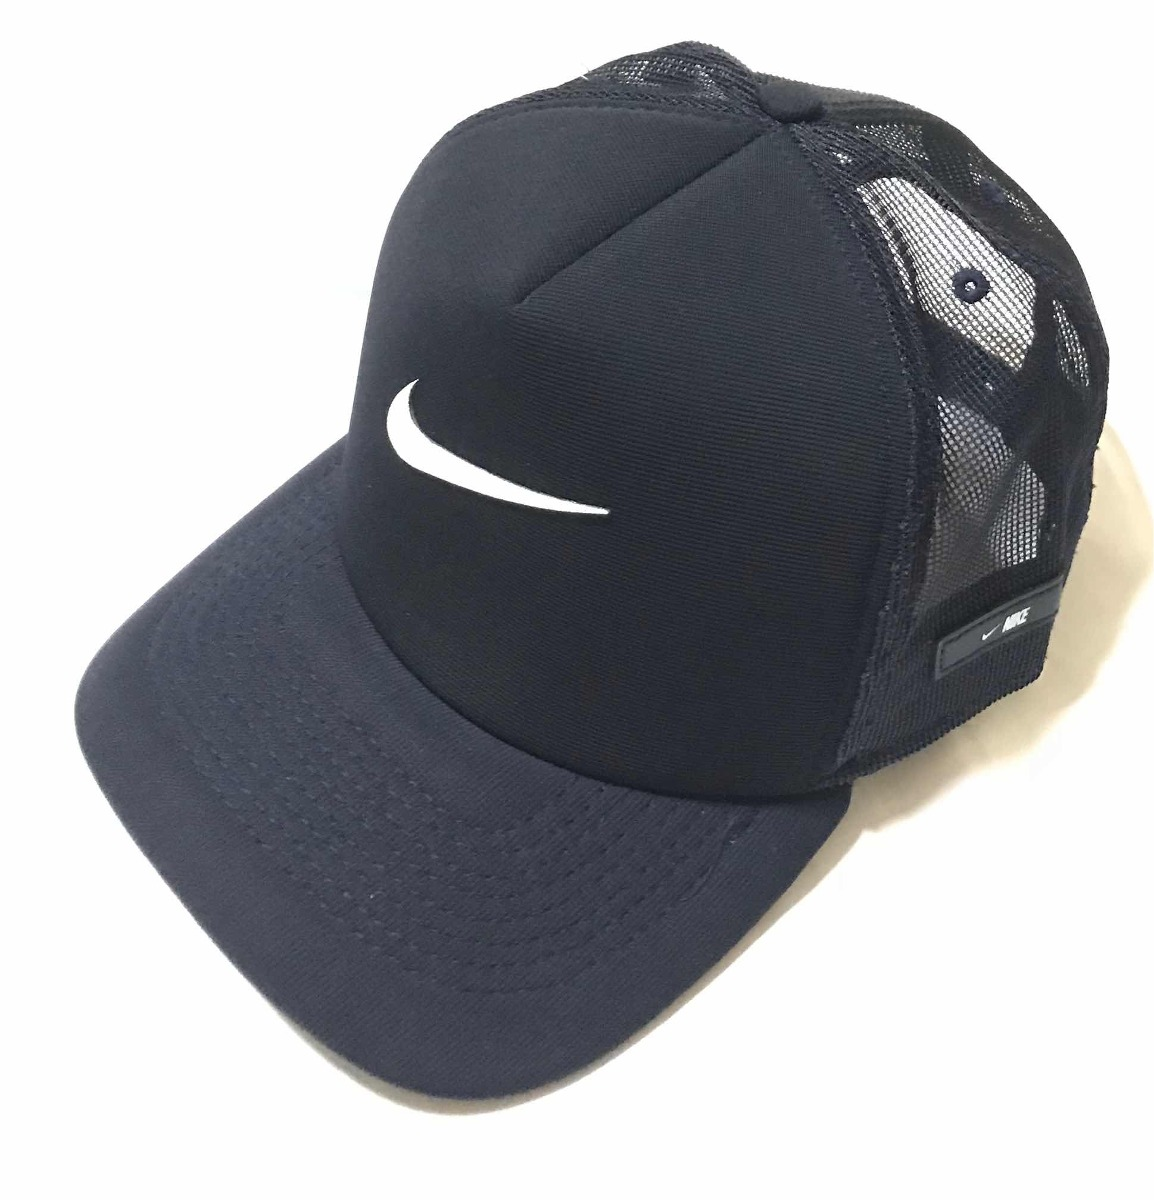 8f516a5b00a22 Boné Nike Aba Curva Air Logo Pano Fita Classic Strapback Azu - R  45 ...